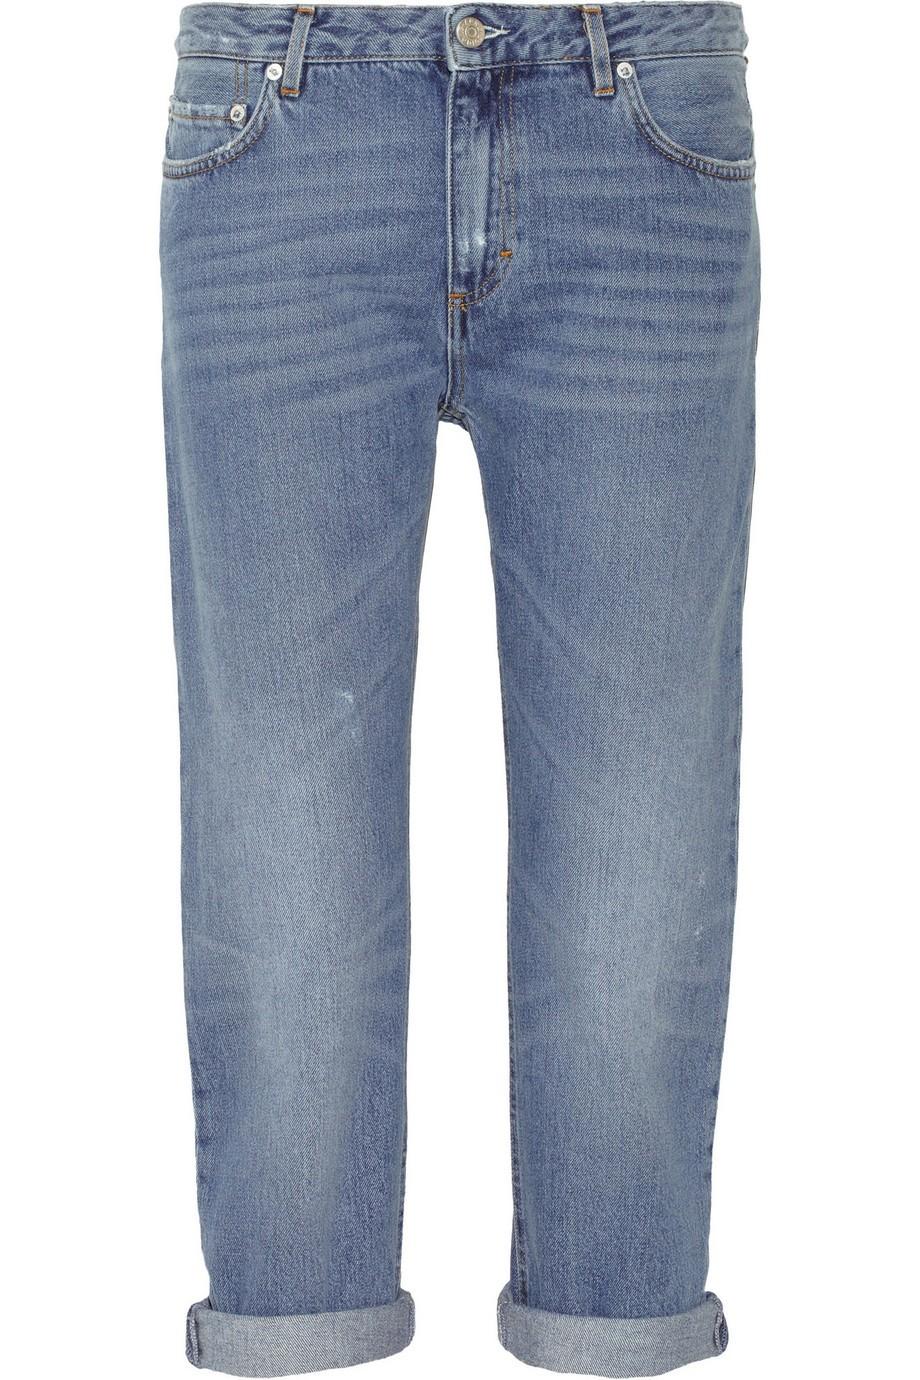 Pop Light Vintage boyfriend jeans